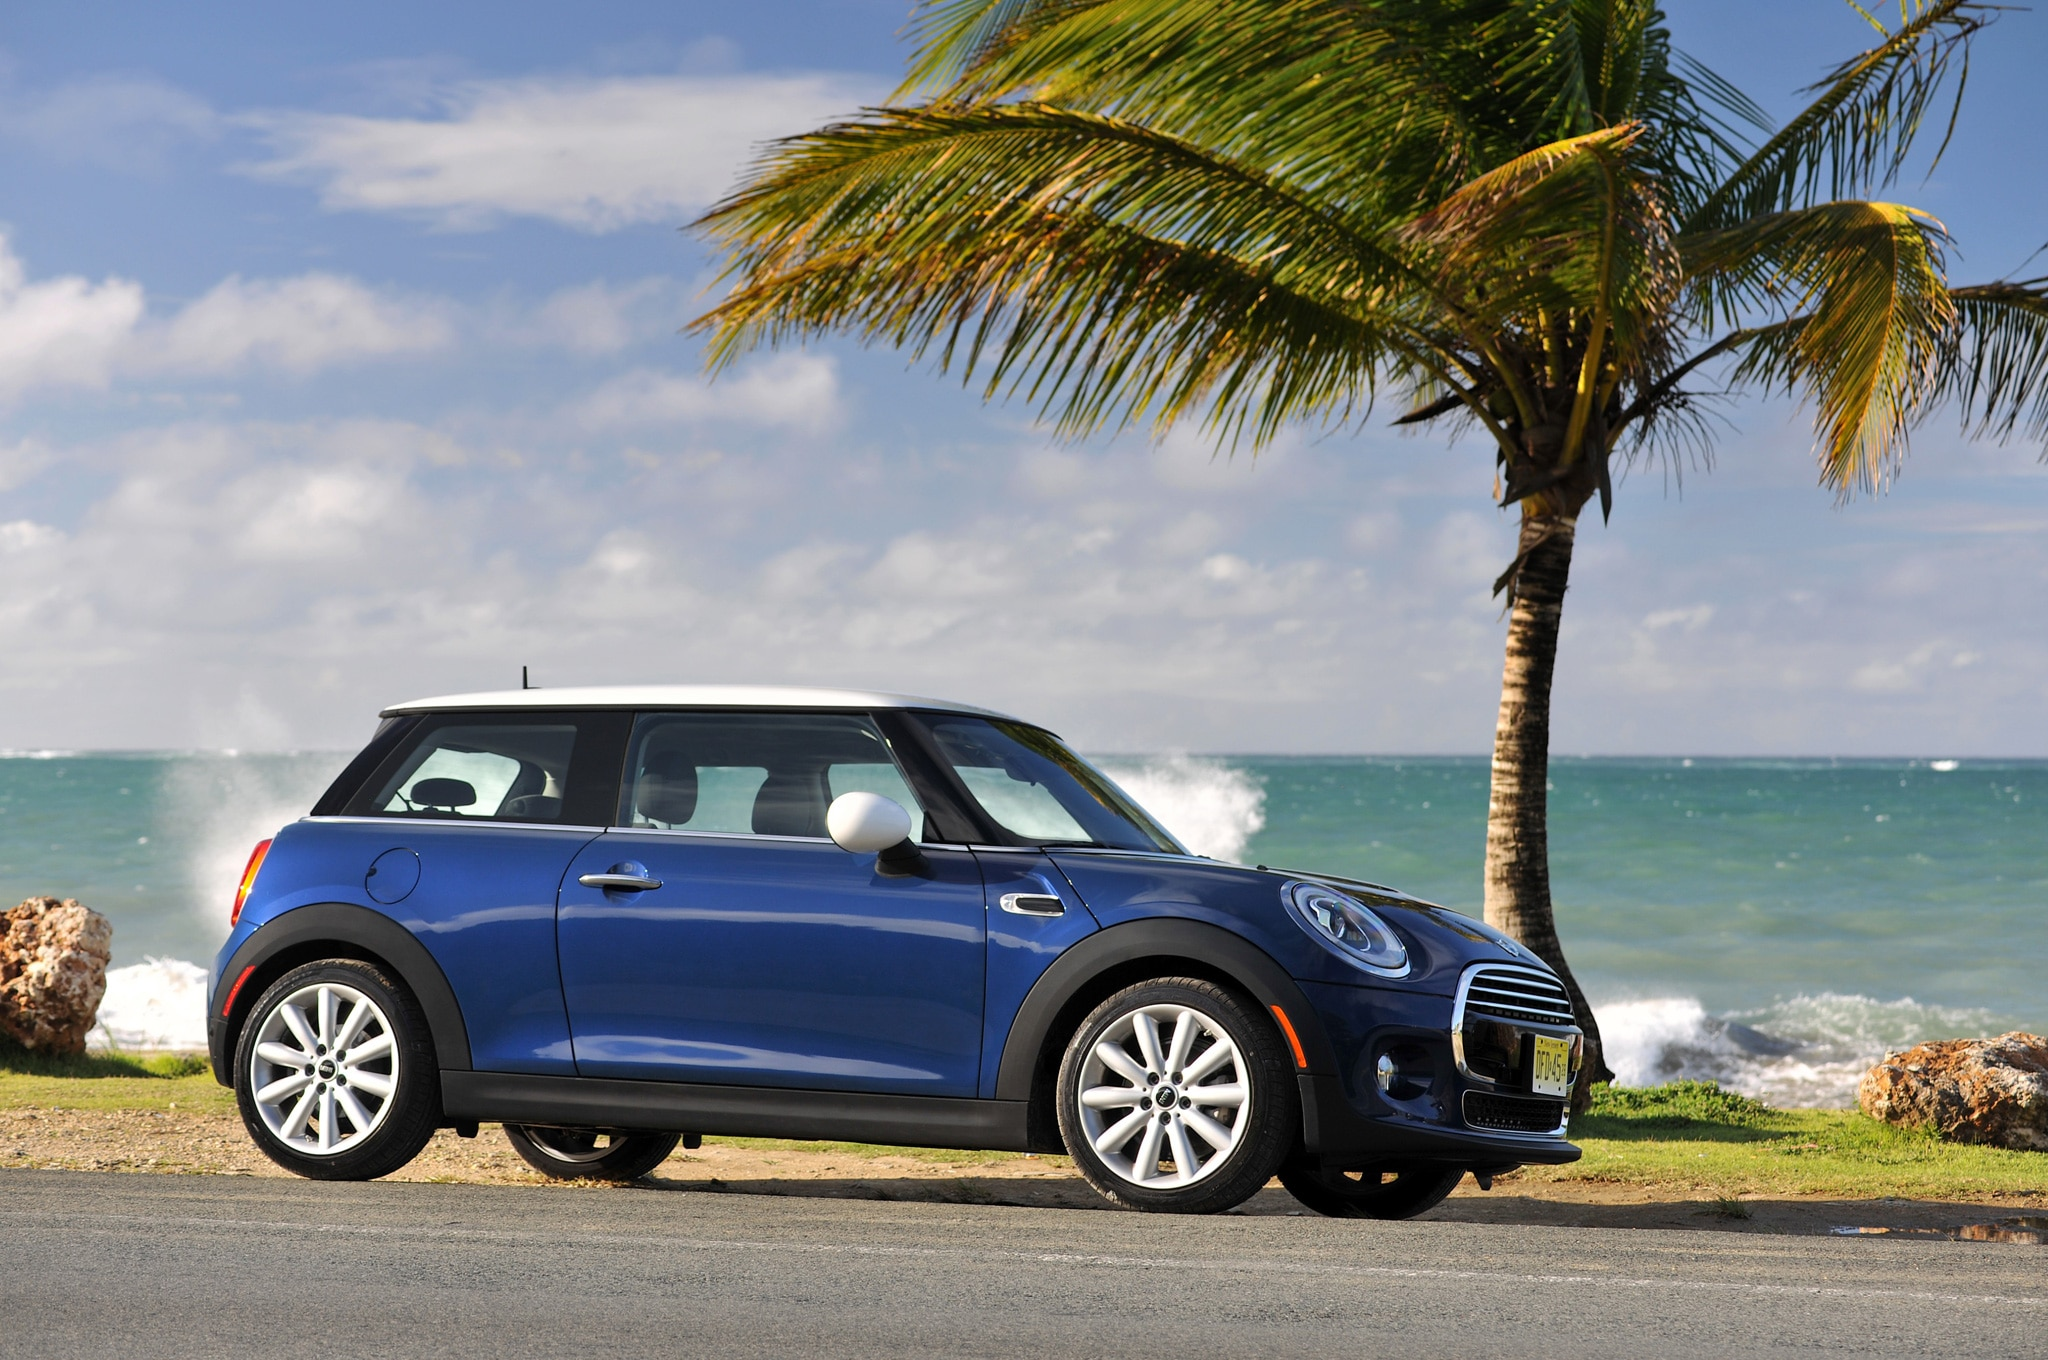 2014 Mini Cooper Side View On Coastline 22